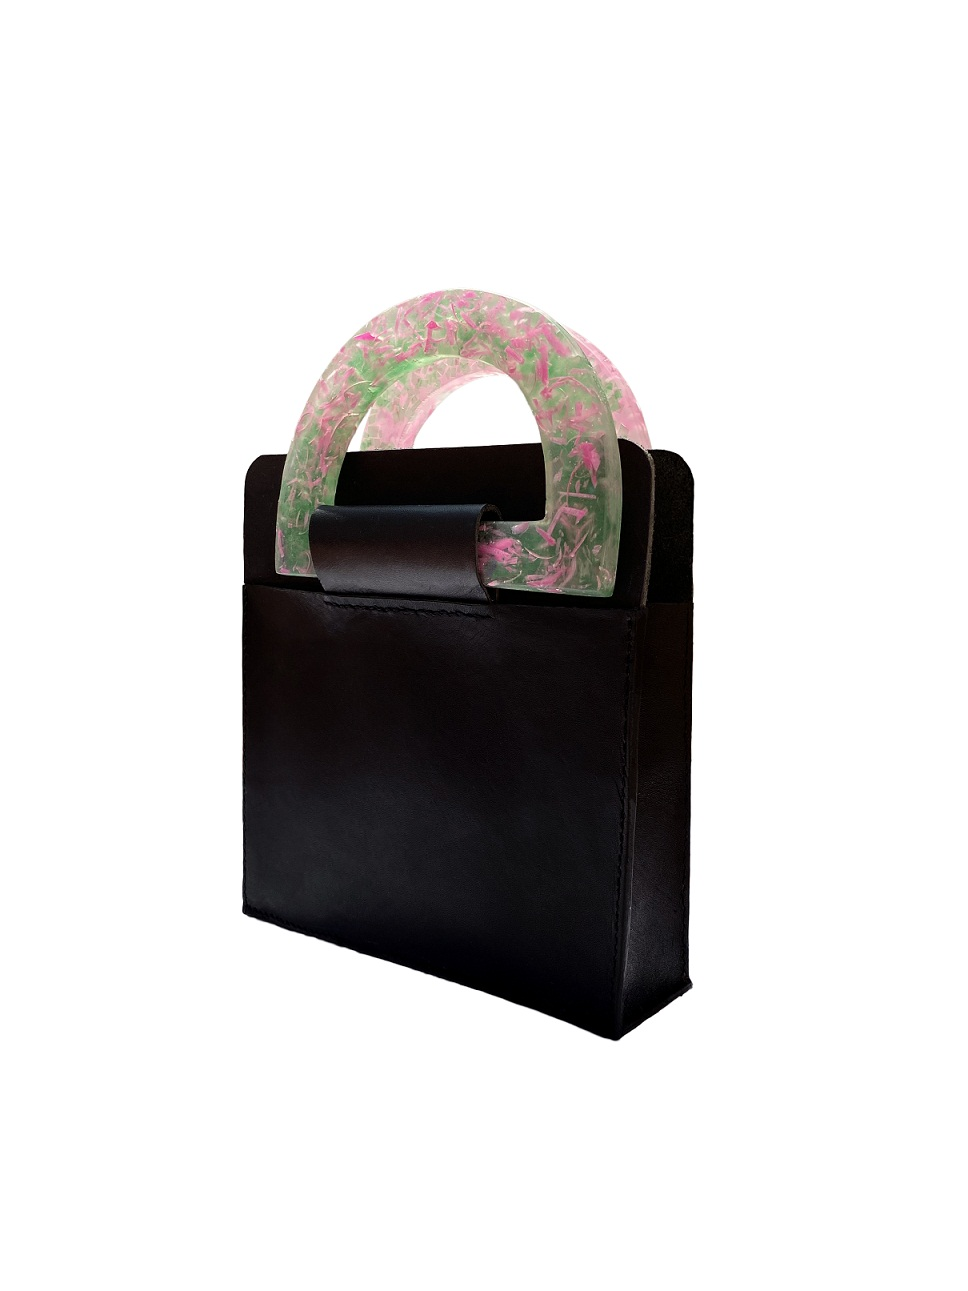 "Handbag Designer 101 Announces Finalists for the Fourteenth Annual ""Handbag Awards"" - green_julianavillarreal"